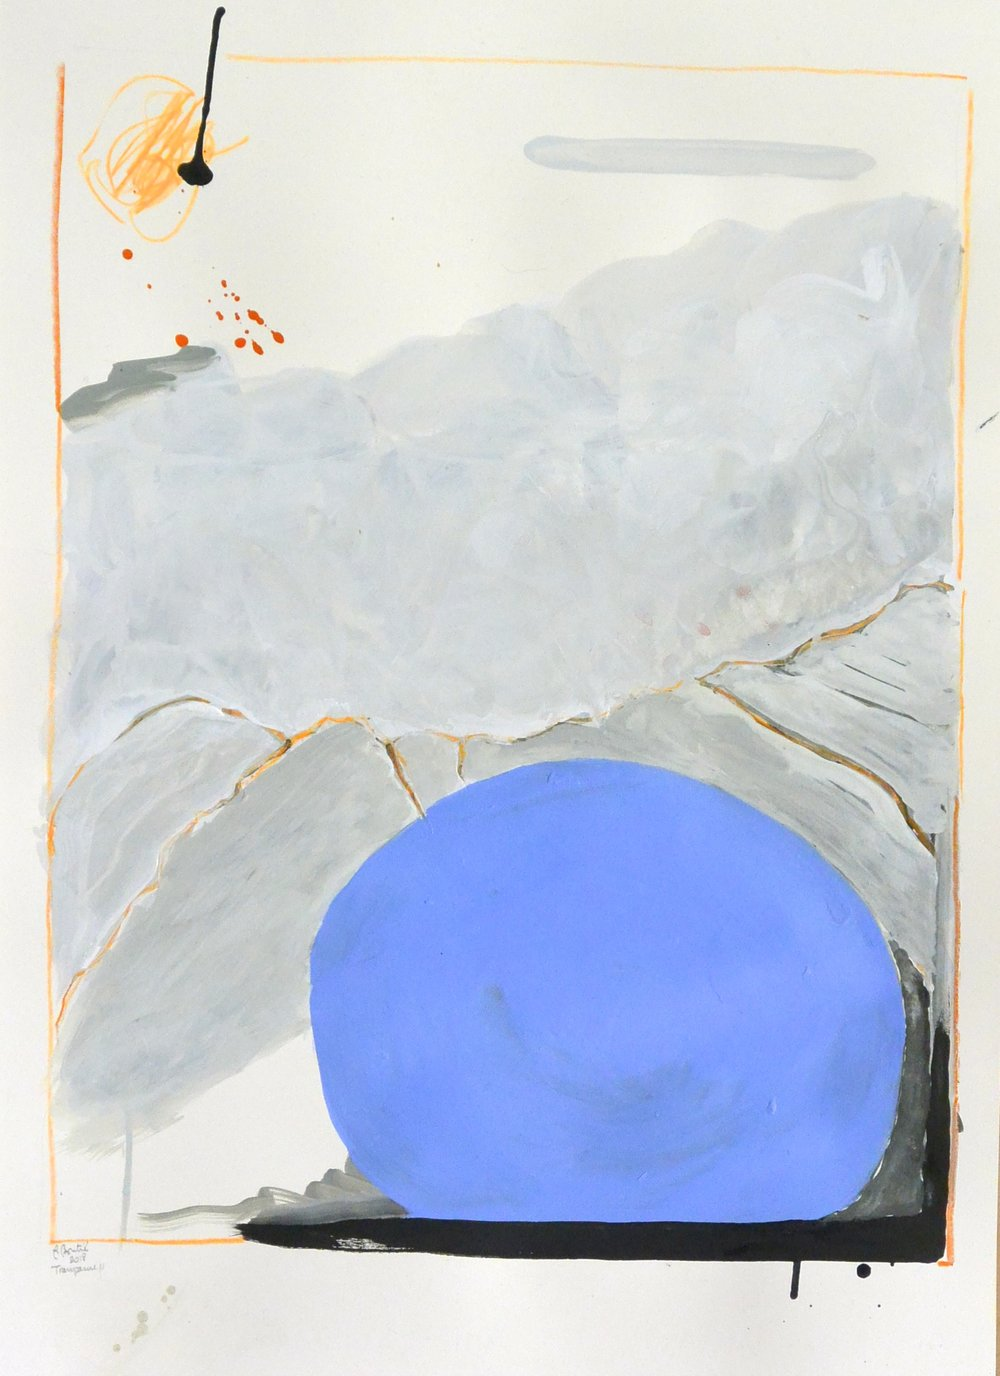 Transparue II technique mixte sur papier Fabriano Artistico  56 x 38 cm